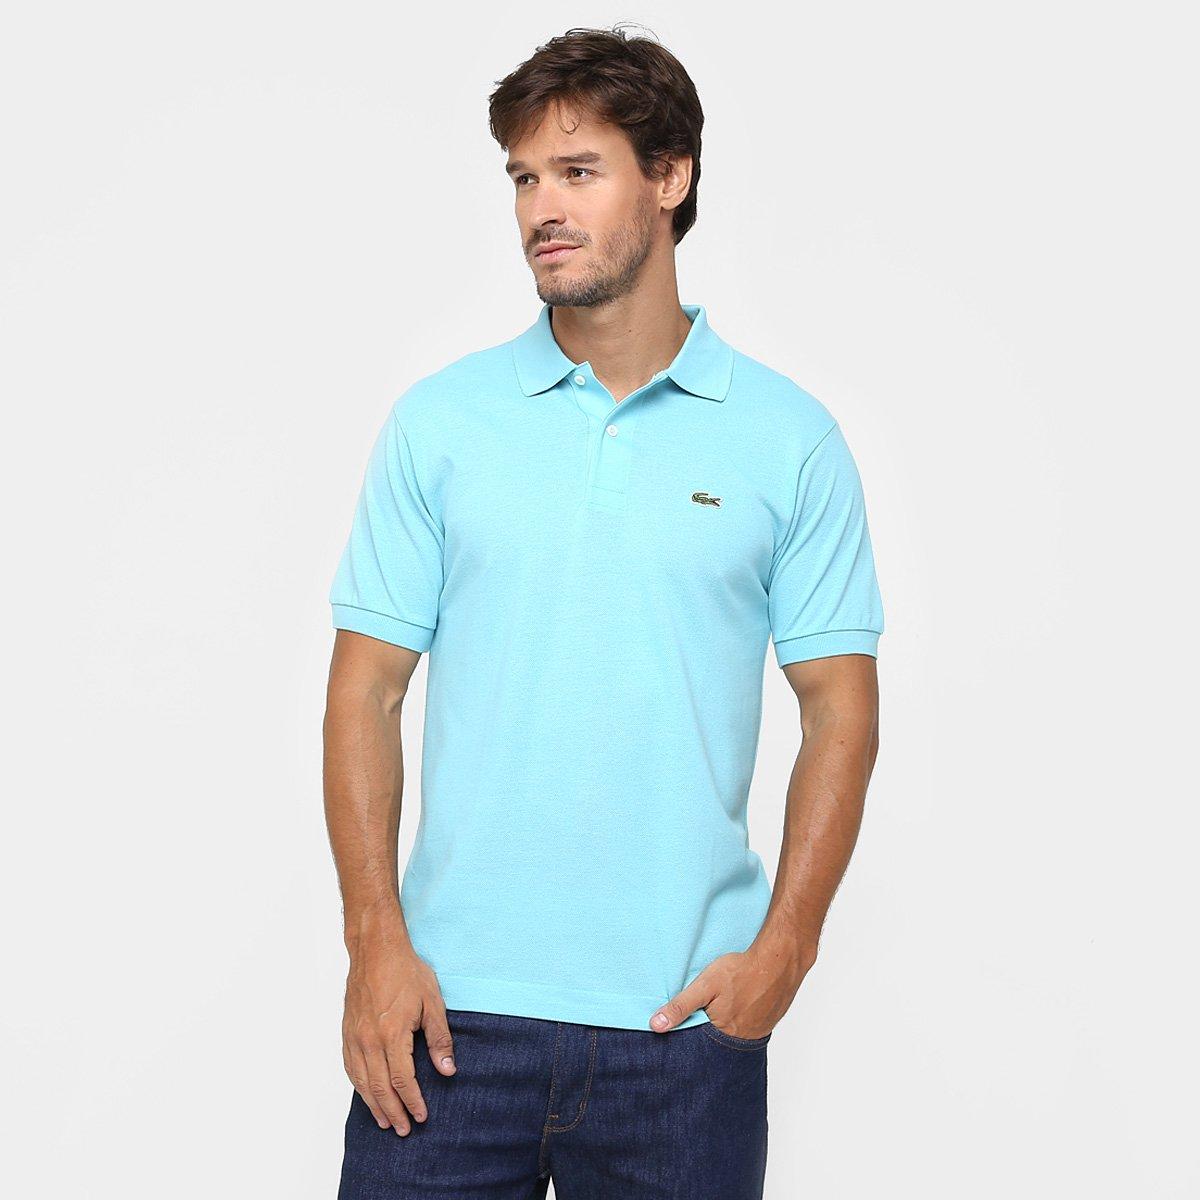 c4712cddf149b Camisa Polo Lacoste Original Fit Masculina - Azul Piscina - Compre Agora